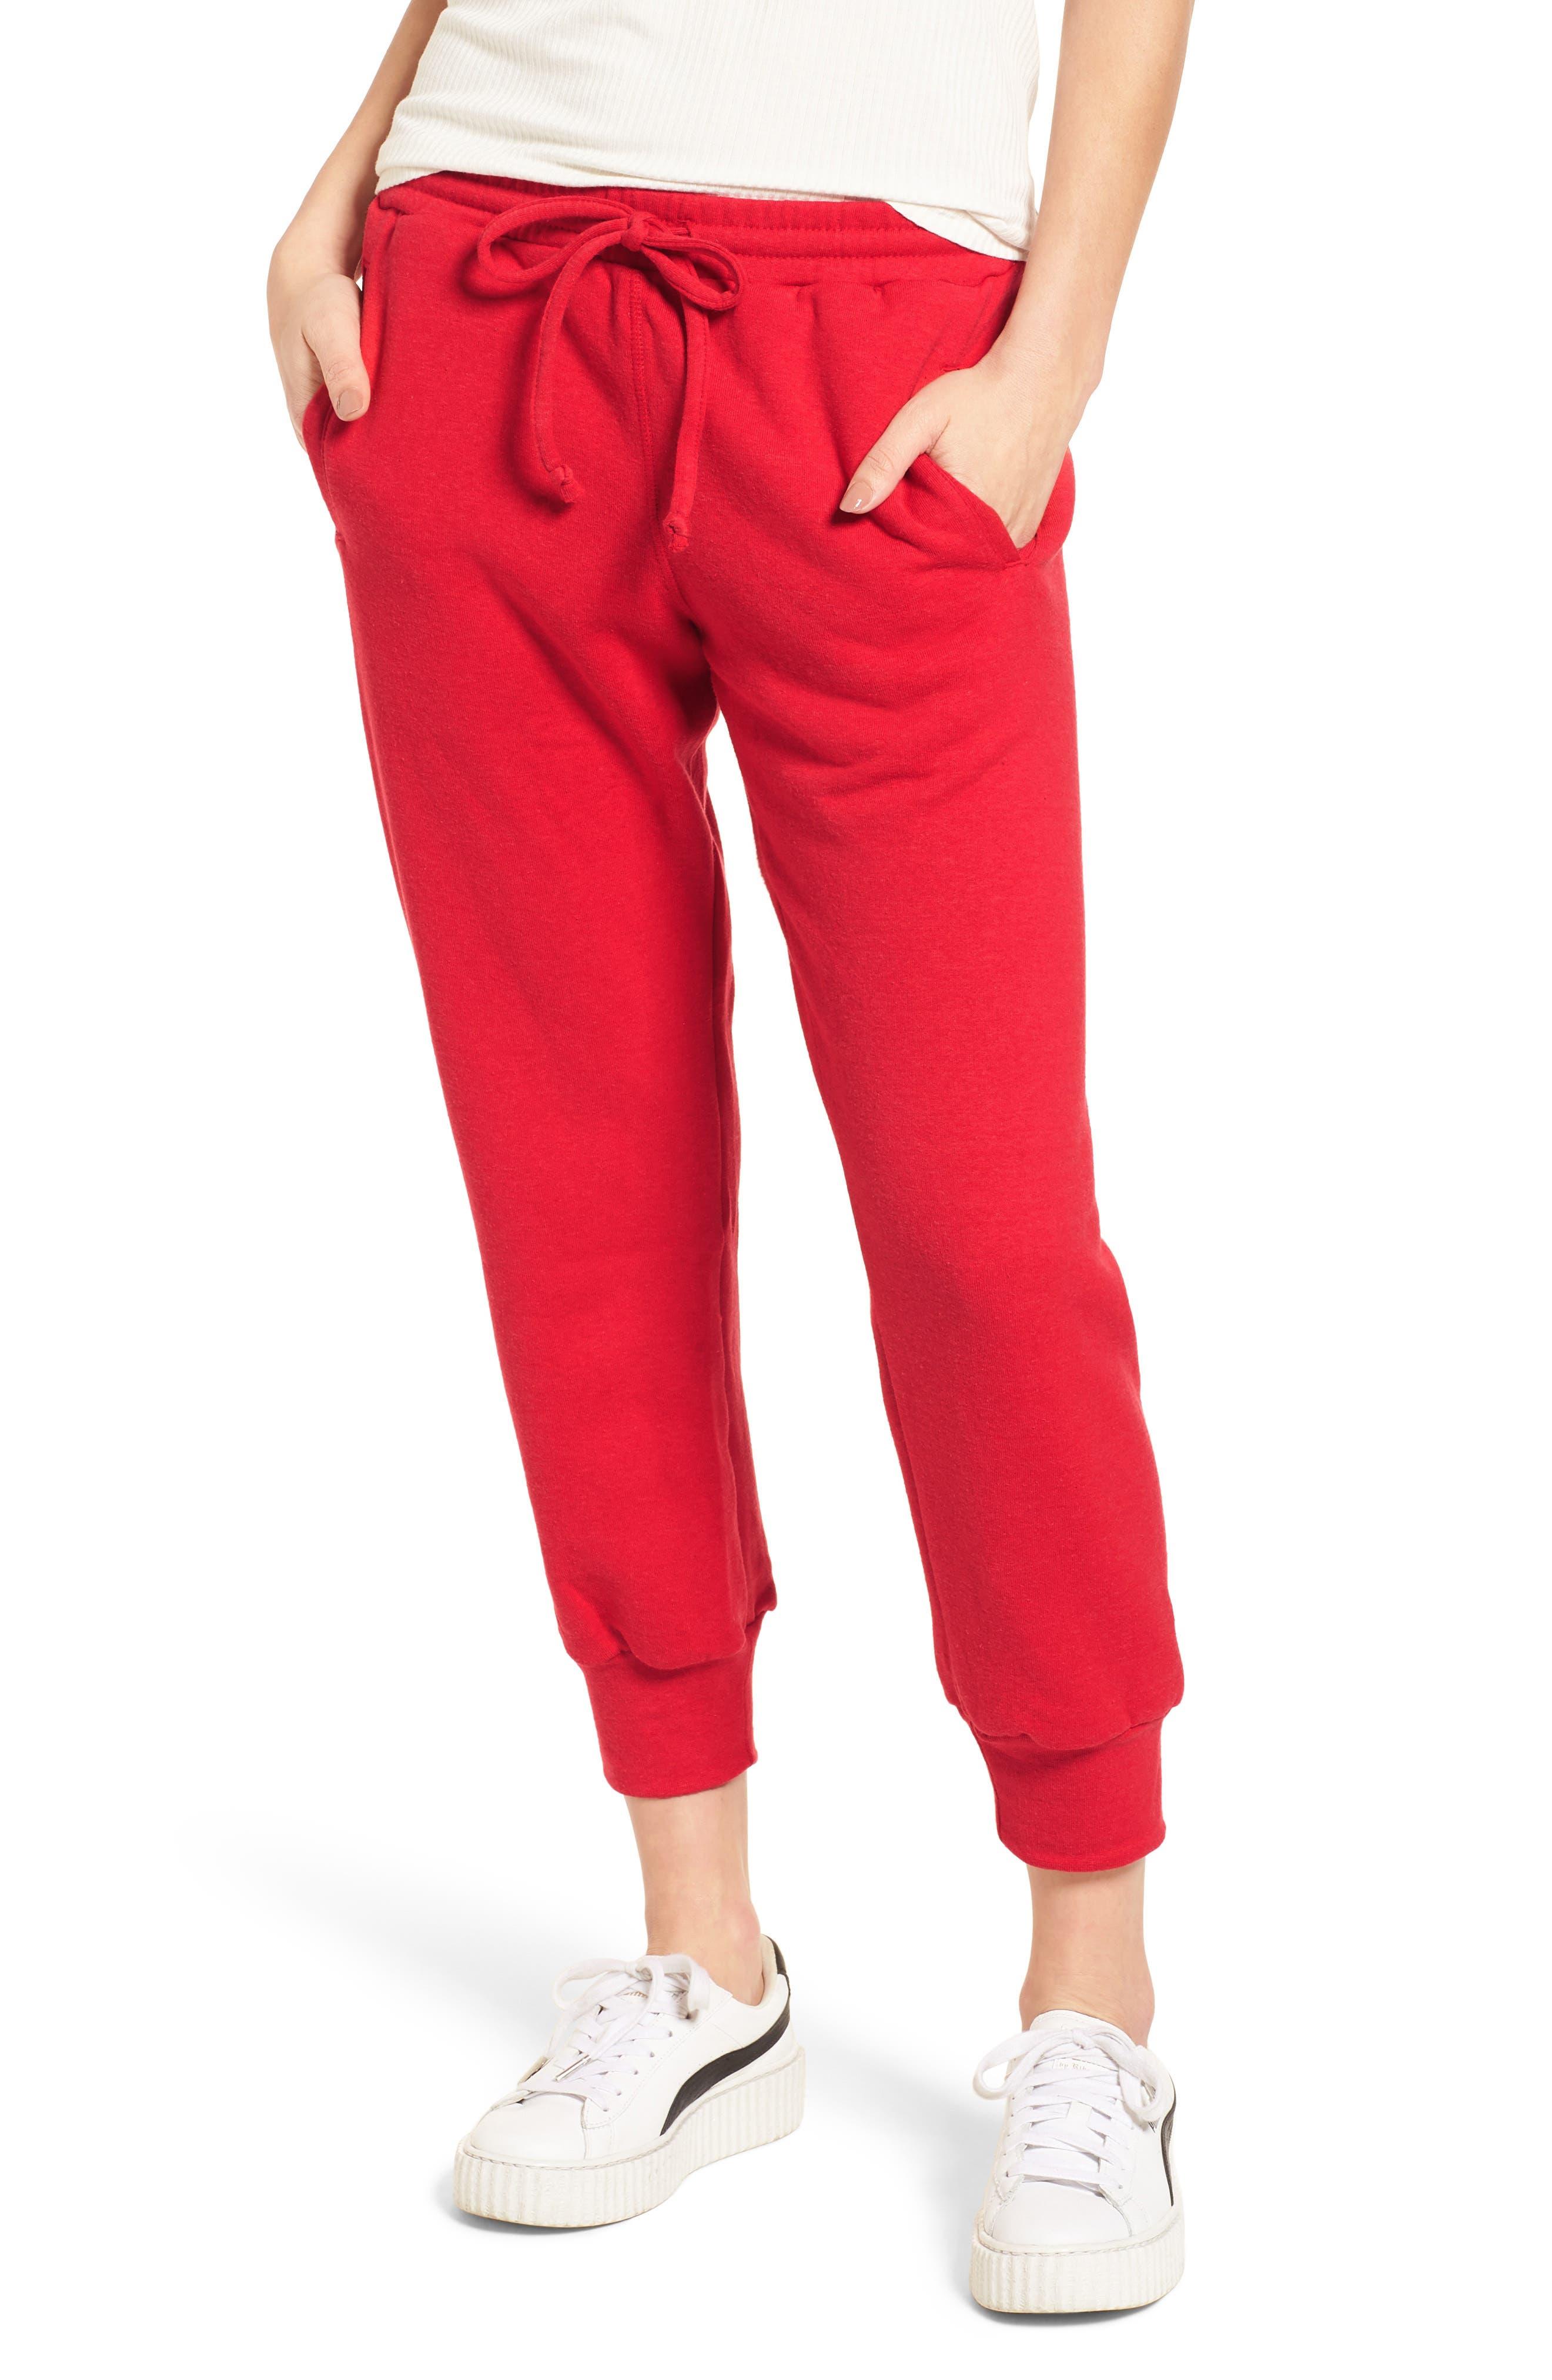 Cambridge Crop Sweatpants,                         Main,                         color, Cherry